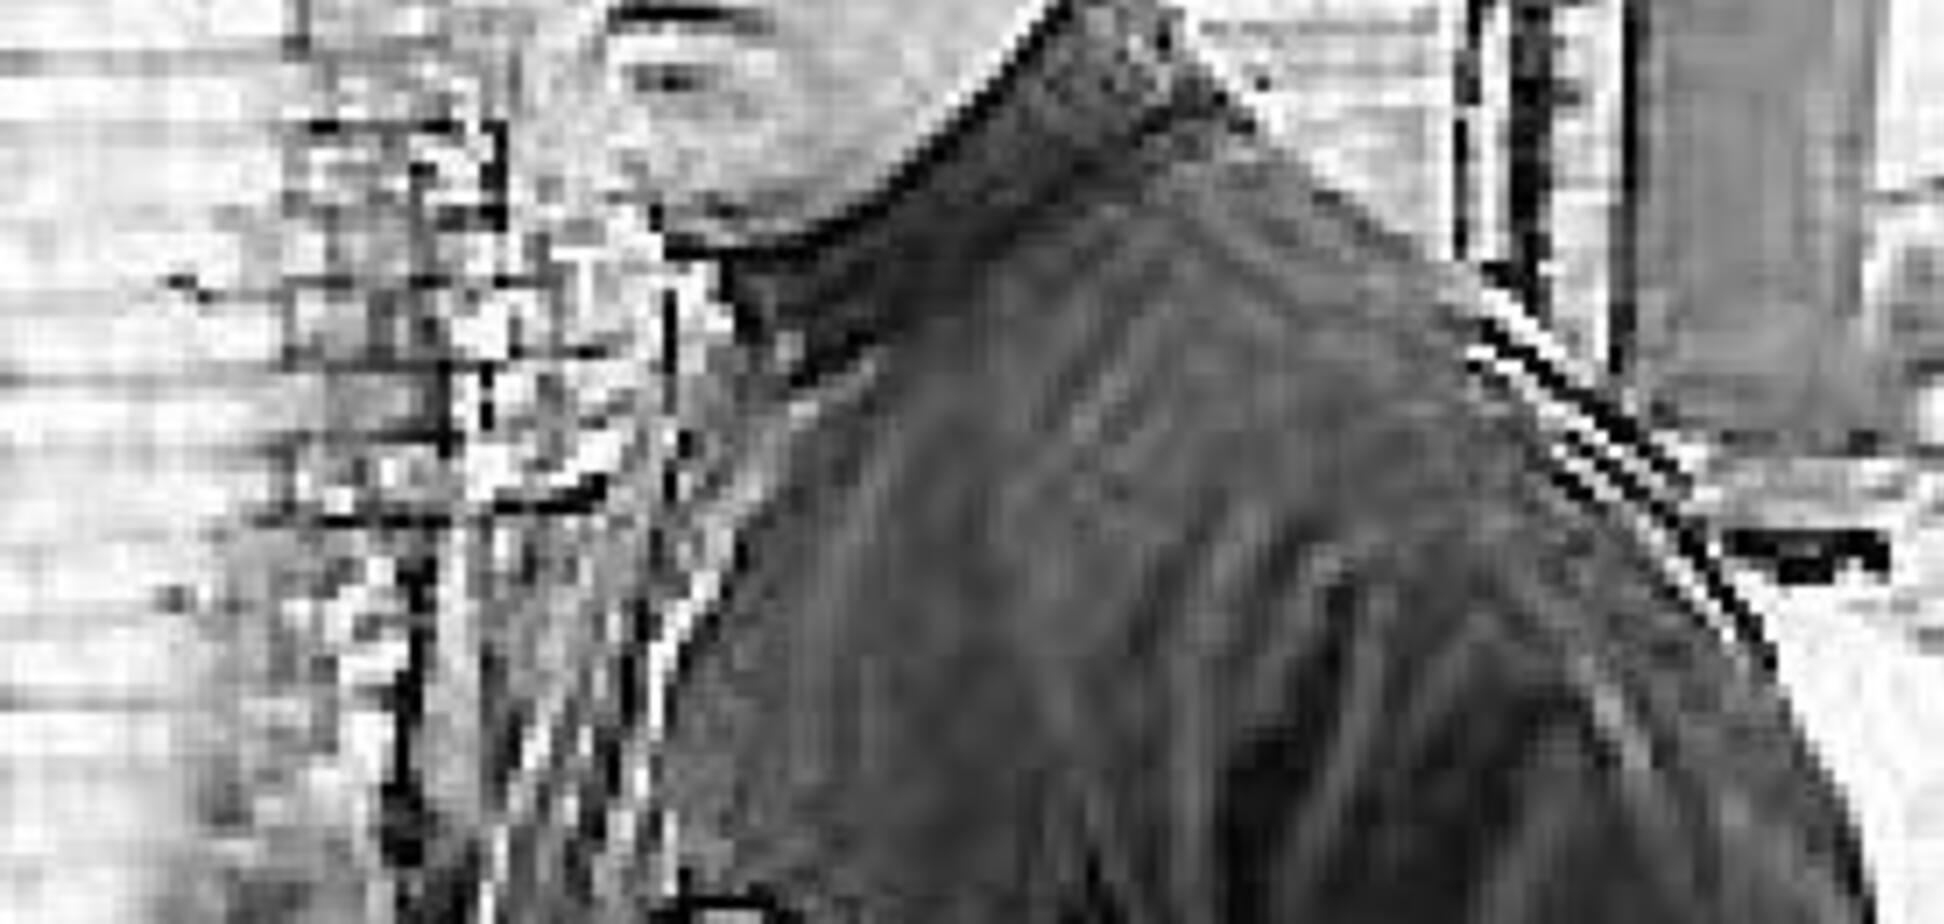 Кримінальний авторитет Гоша Лиепайский пропав